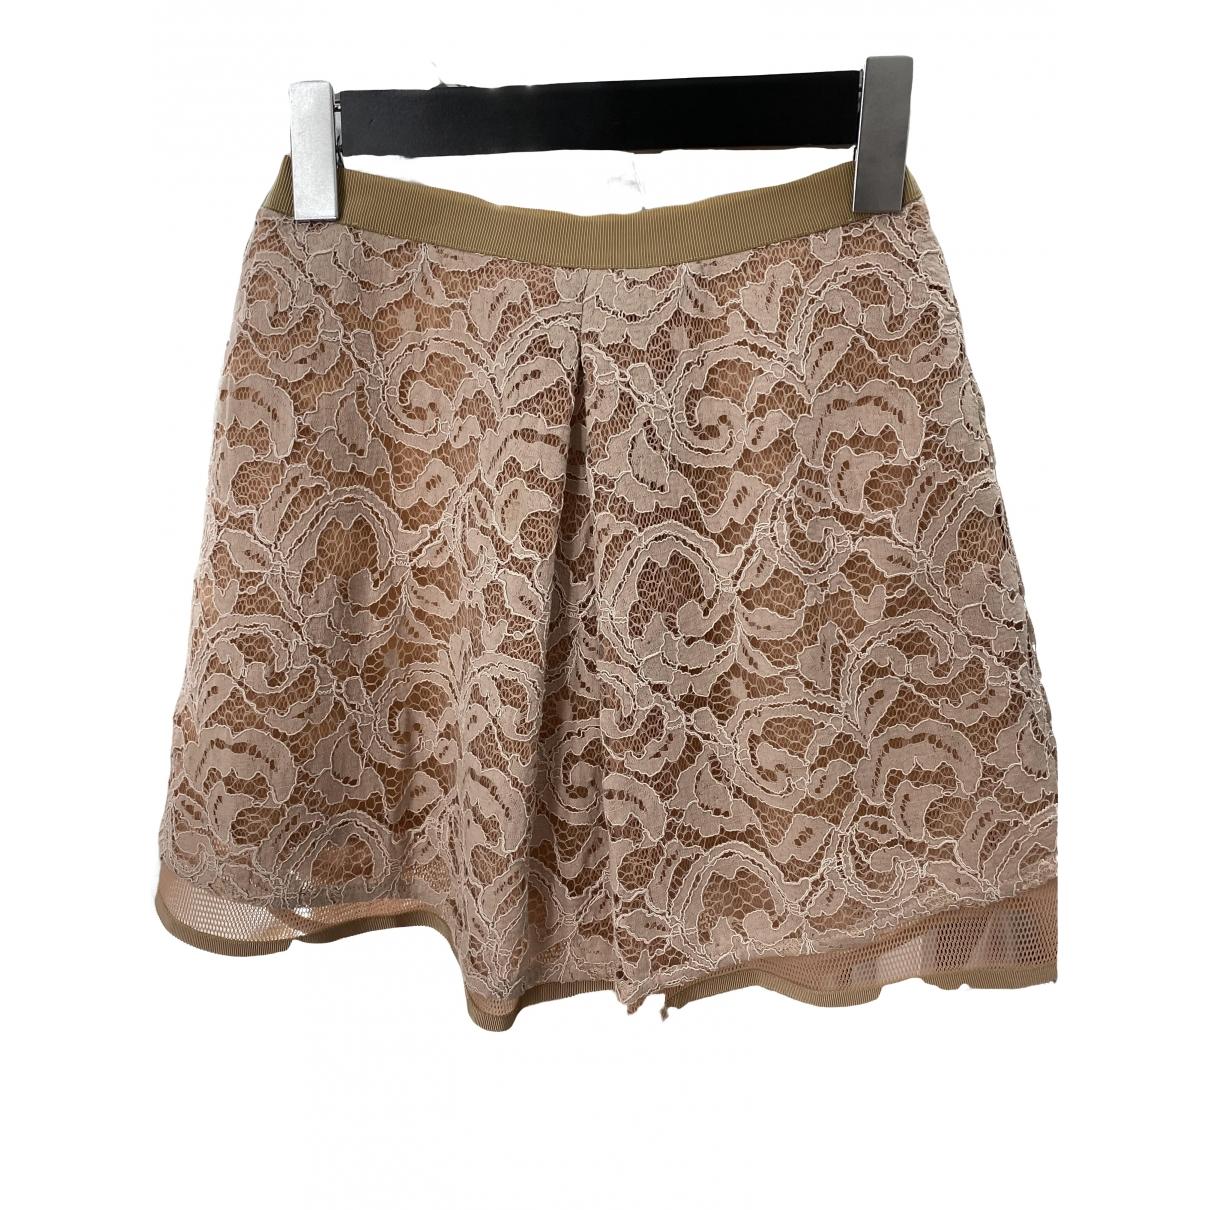 Patrizia Pepe \N Pink skirt for Women 40 IT